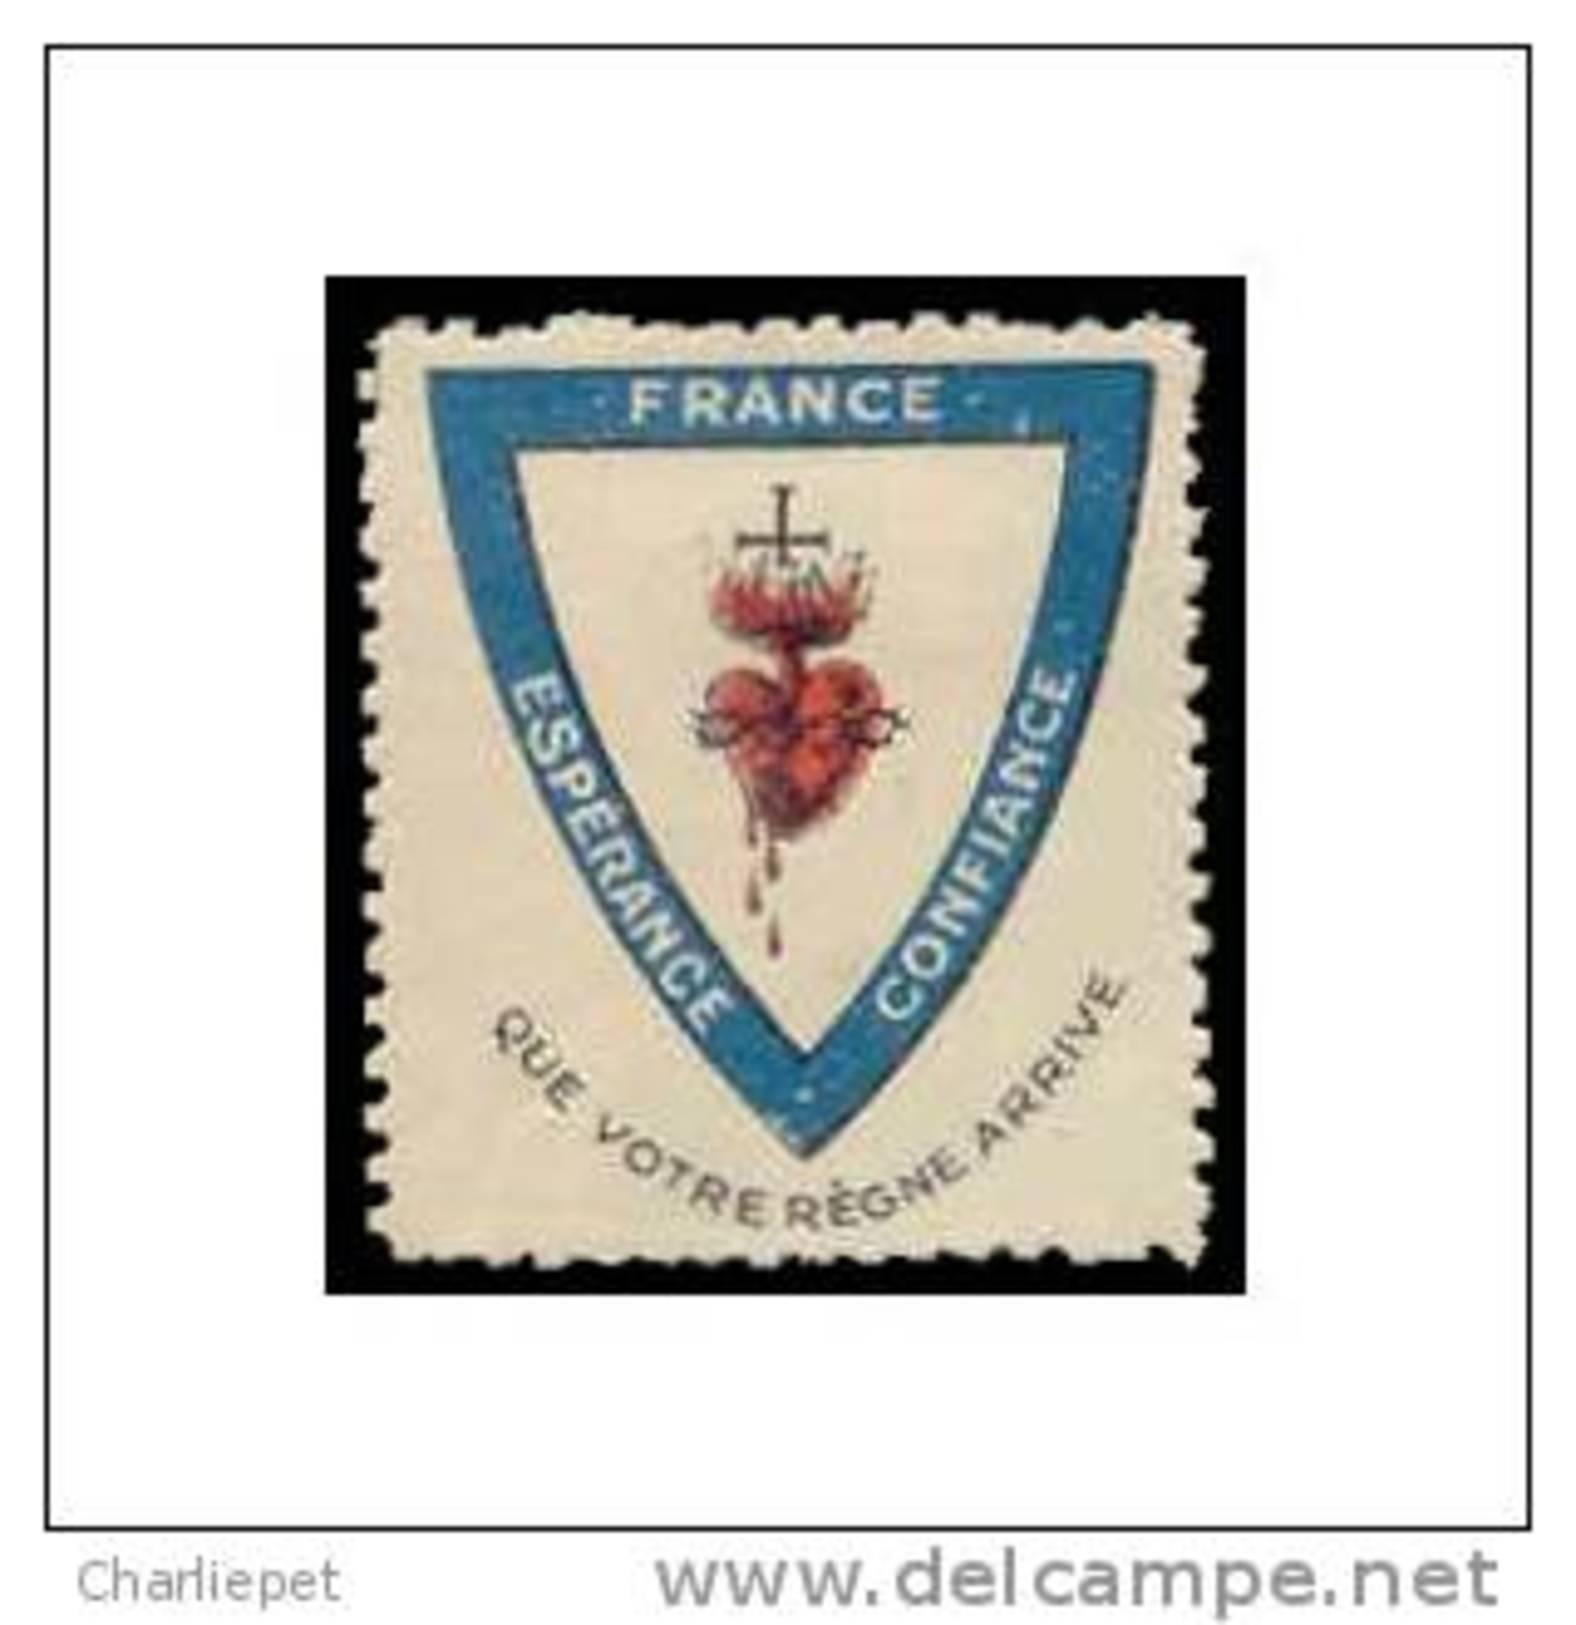 France - Esperance - Confiance WWI Vignette  Military Heritage Poster Stamp - Commemorative Labels